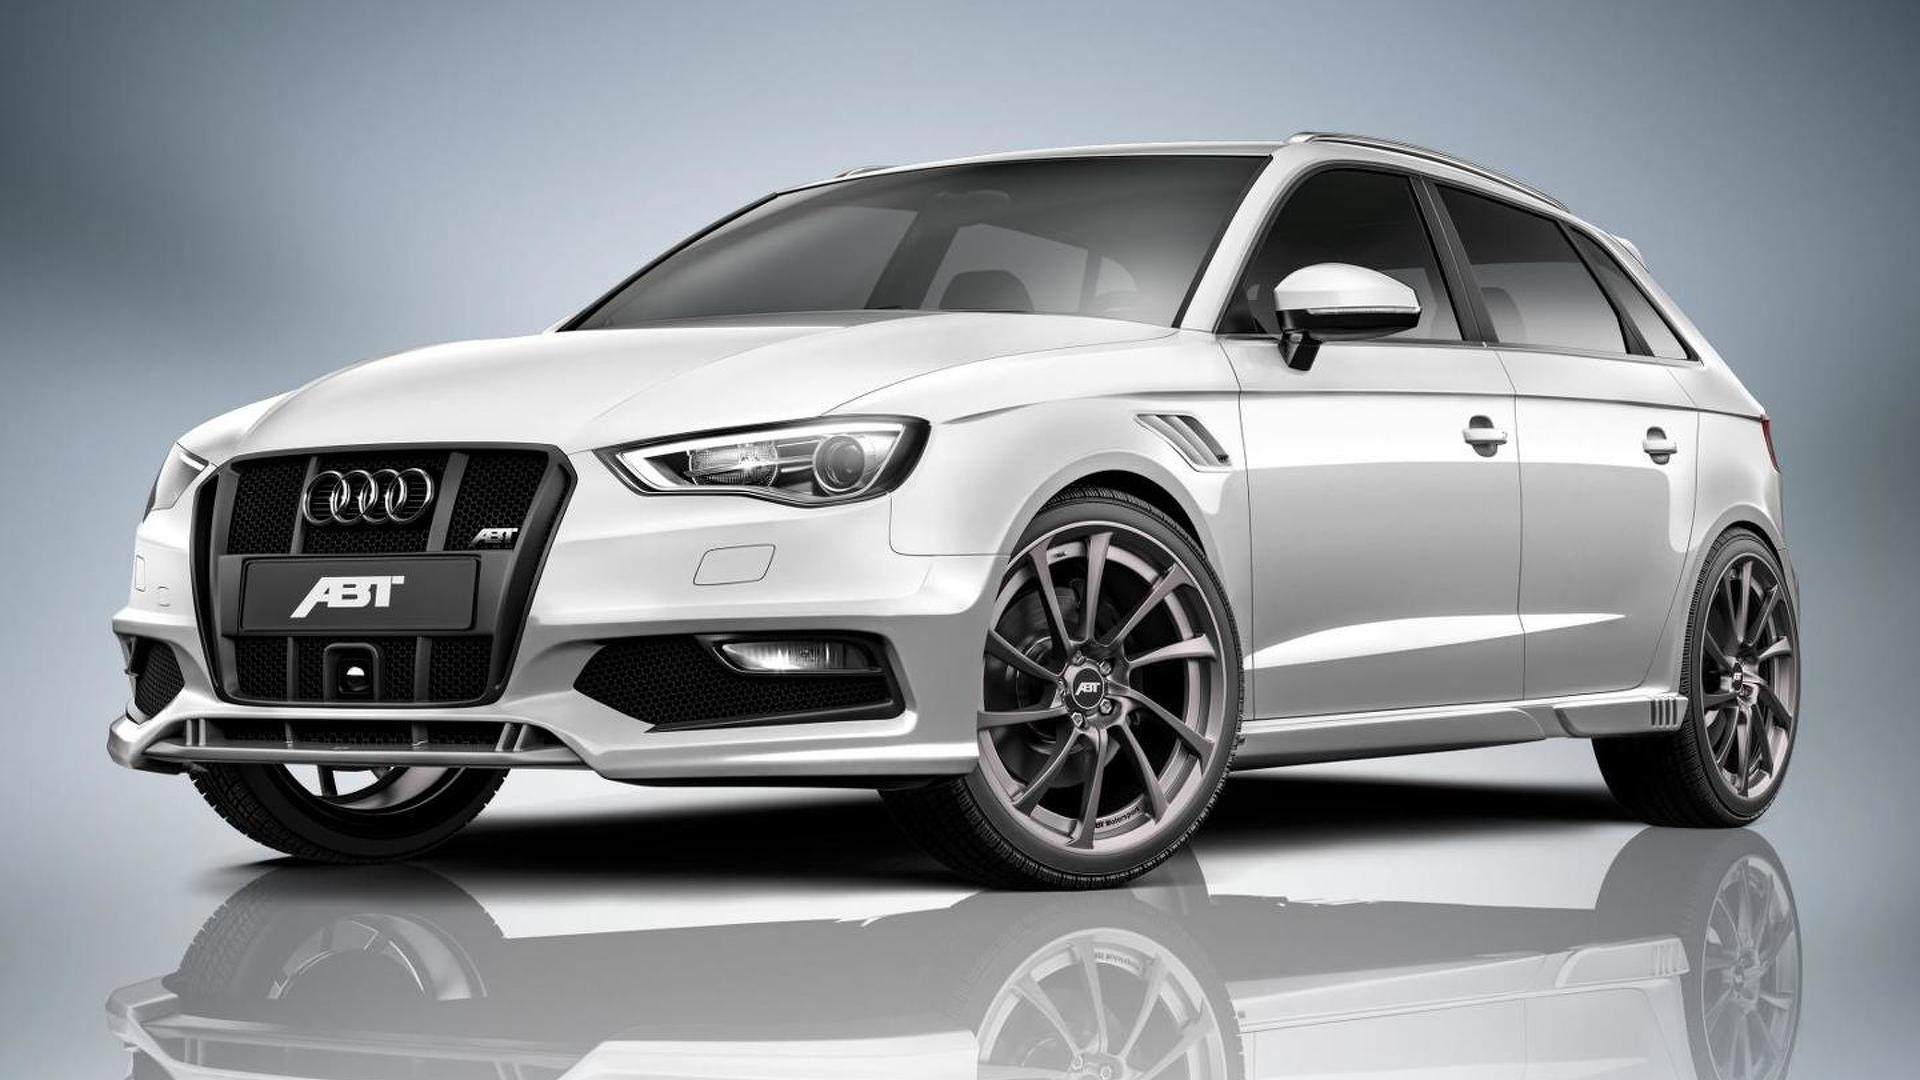 ABT AS3 based on 2013 Audi A3 Sportback revealed